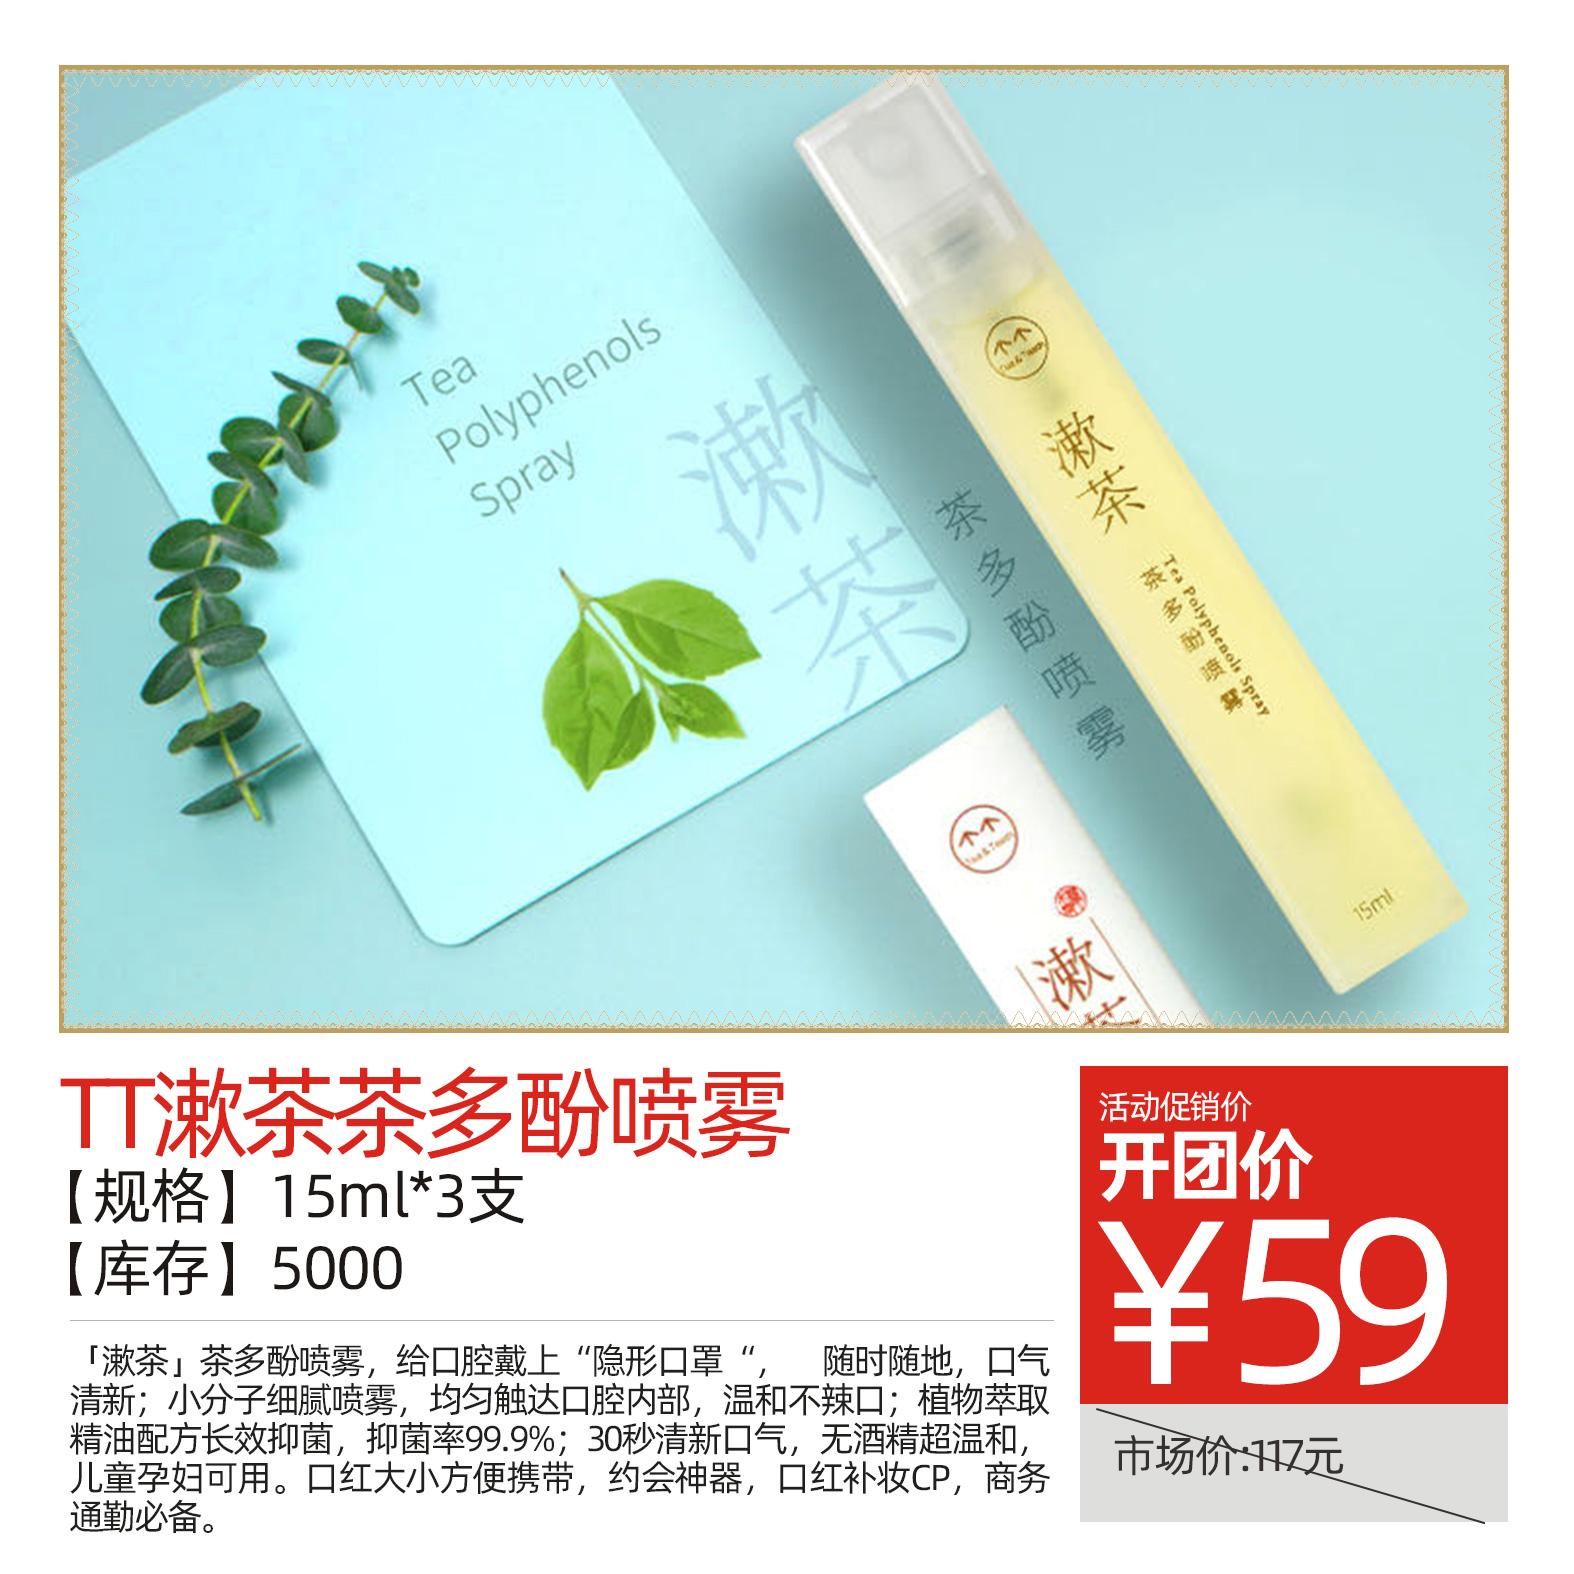 TT漱茶茶多酚喷雾/3支